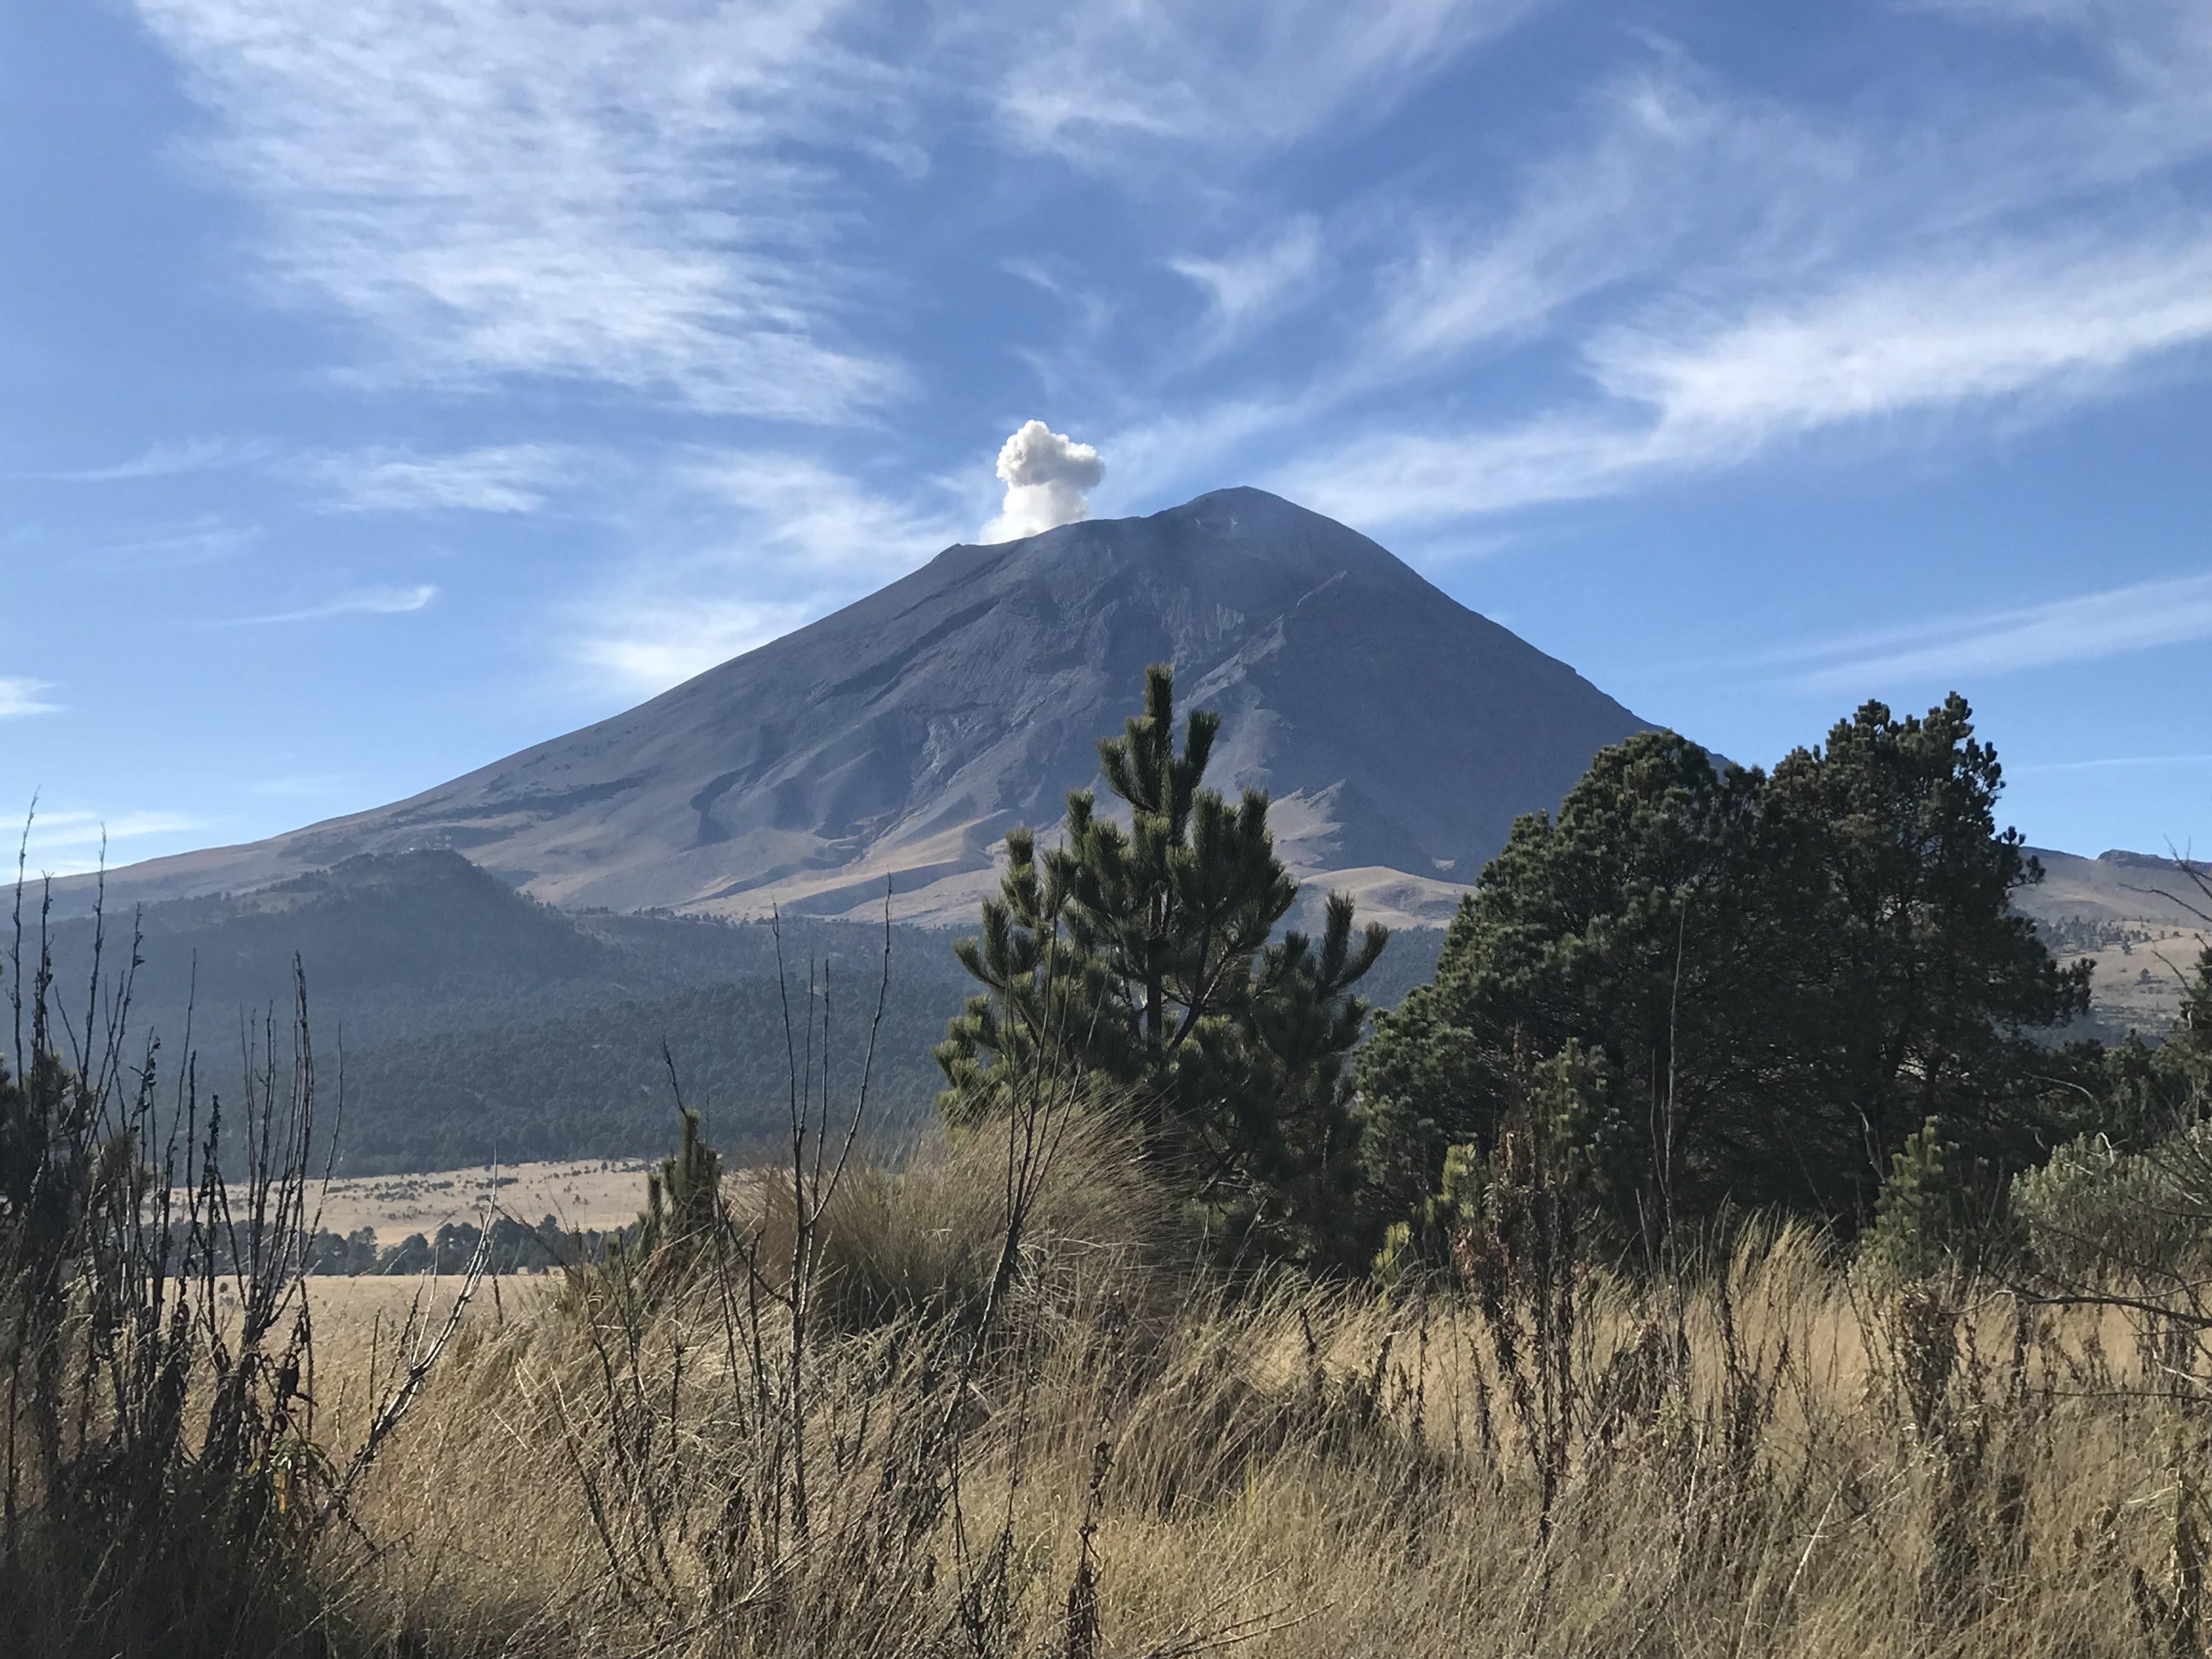 Popo Volcano in Mexico